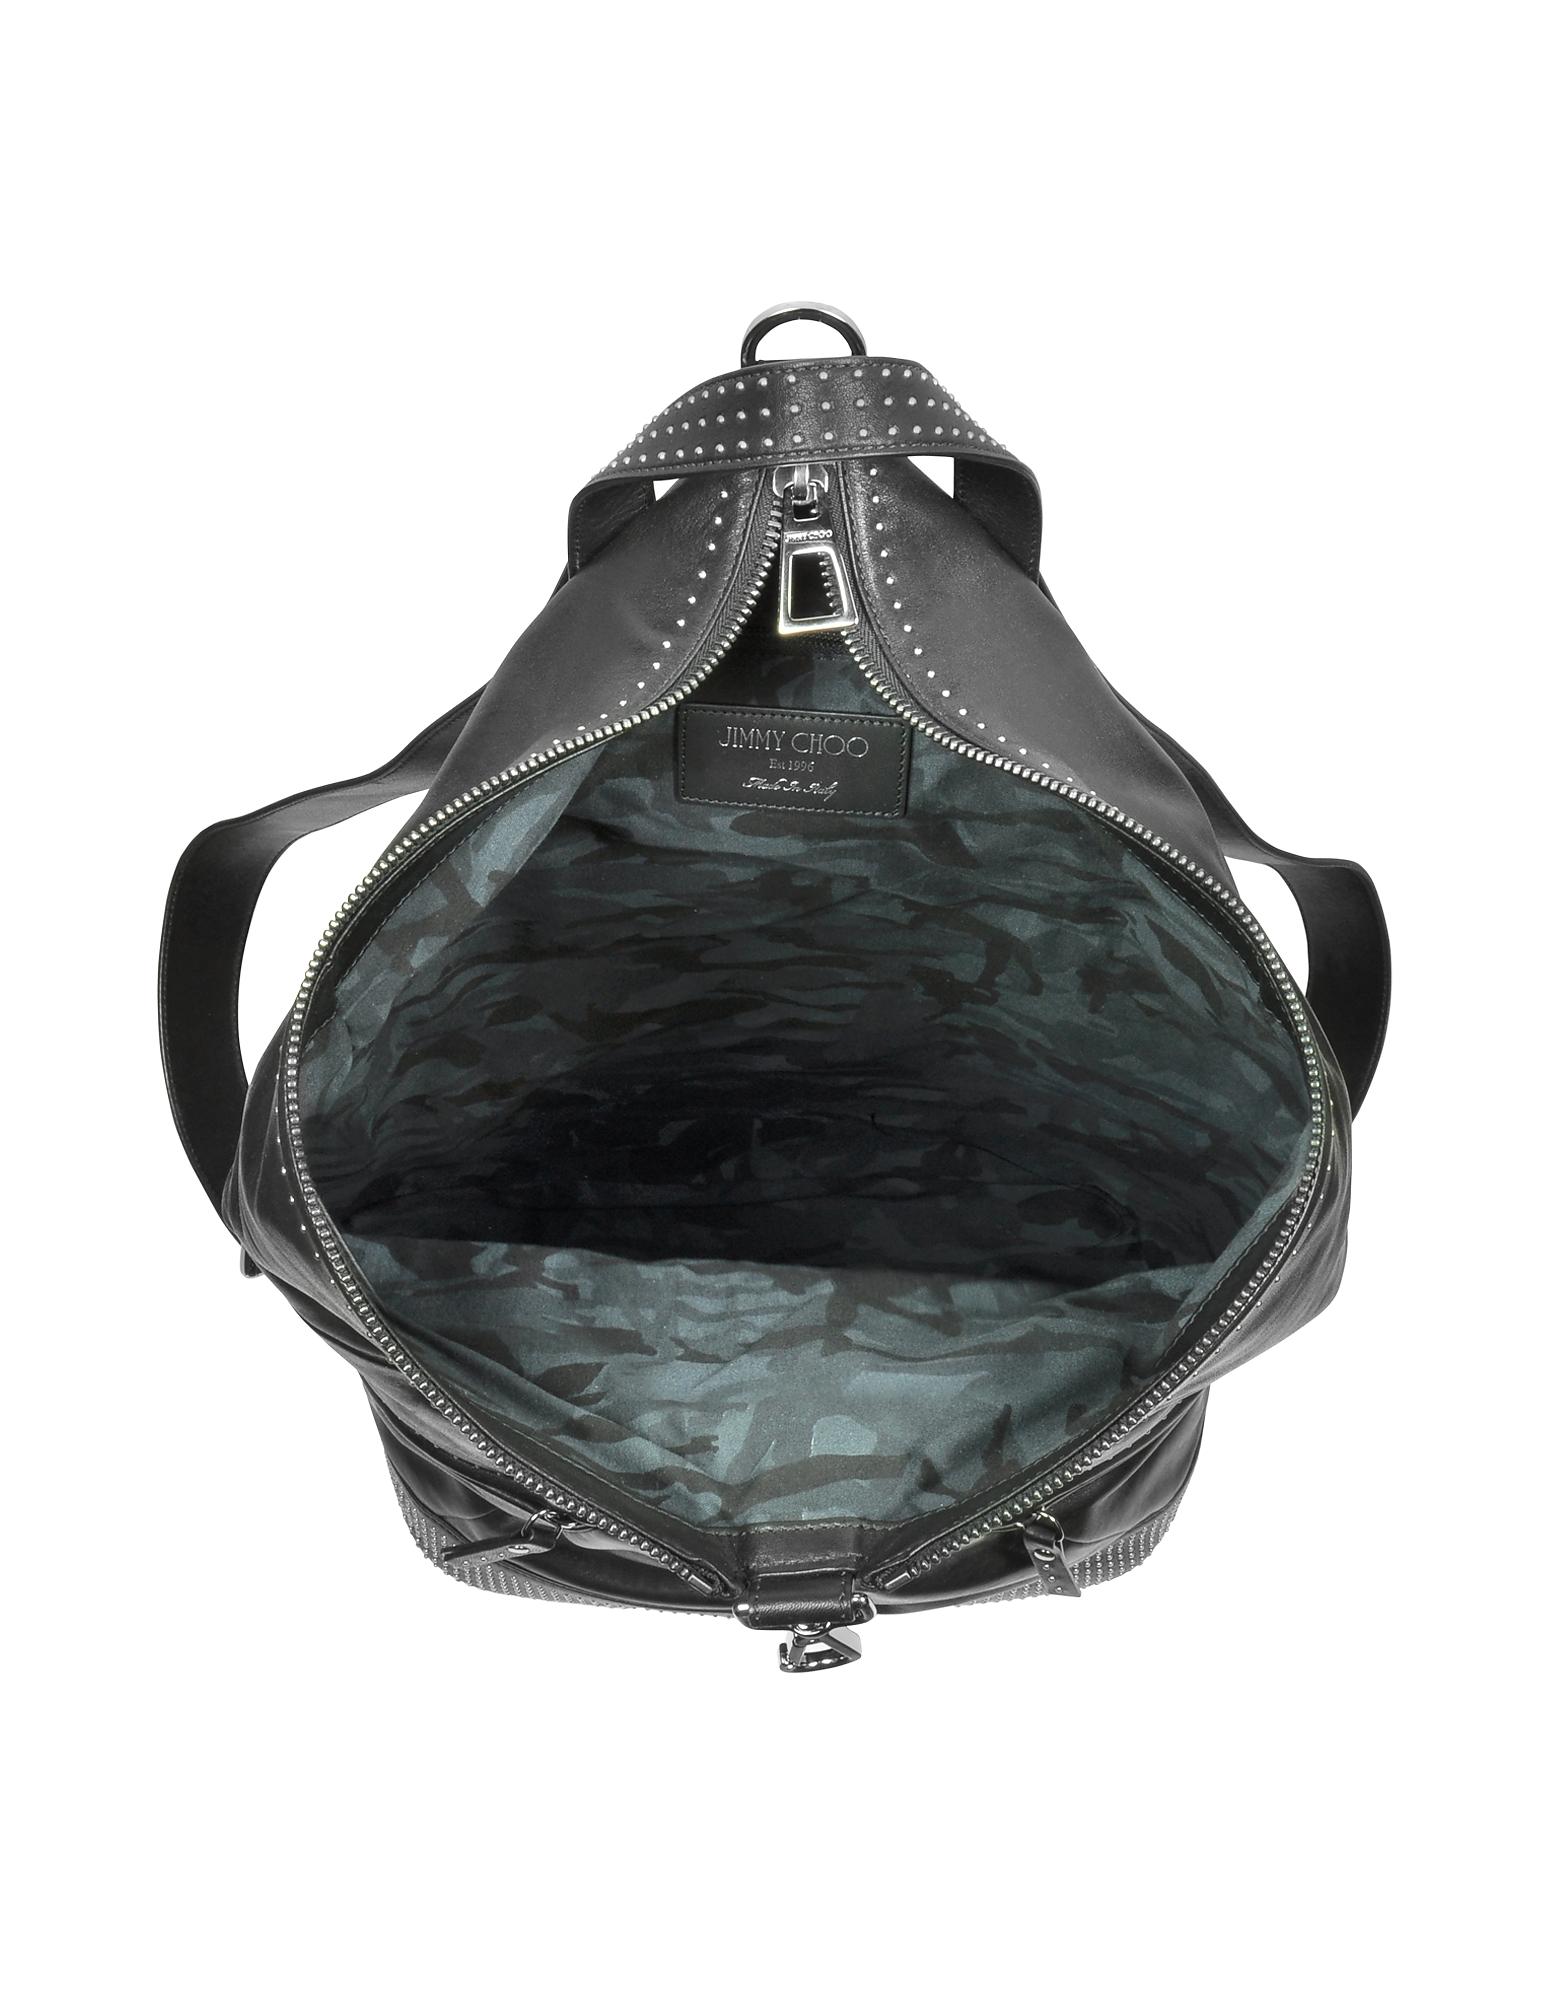 Fitzroy Black Satin Leather Backpack w/Mini Studs от Forzieri.com INT